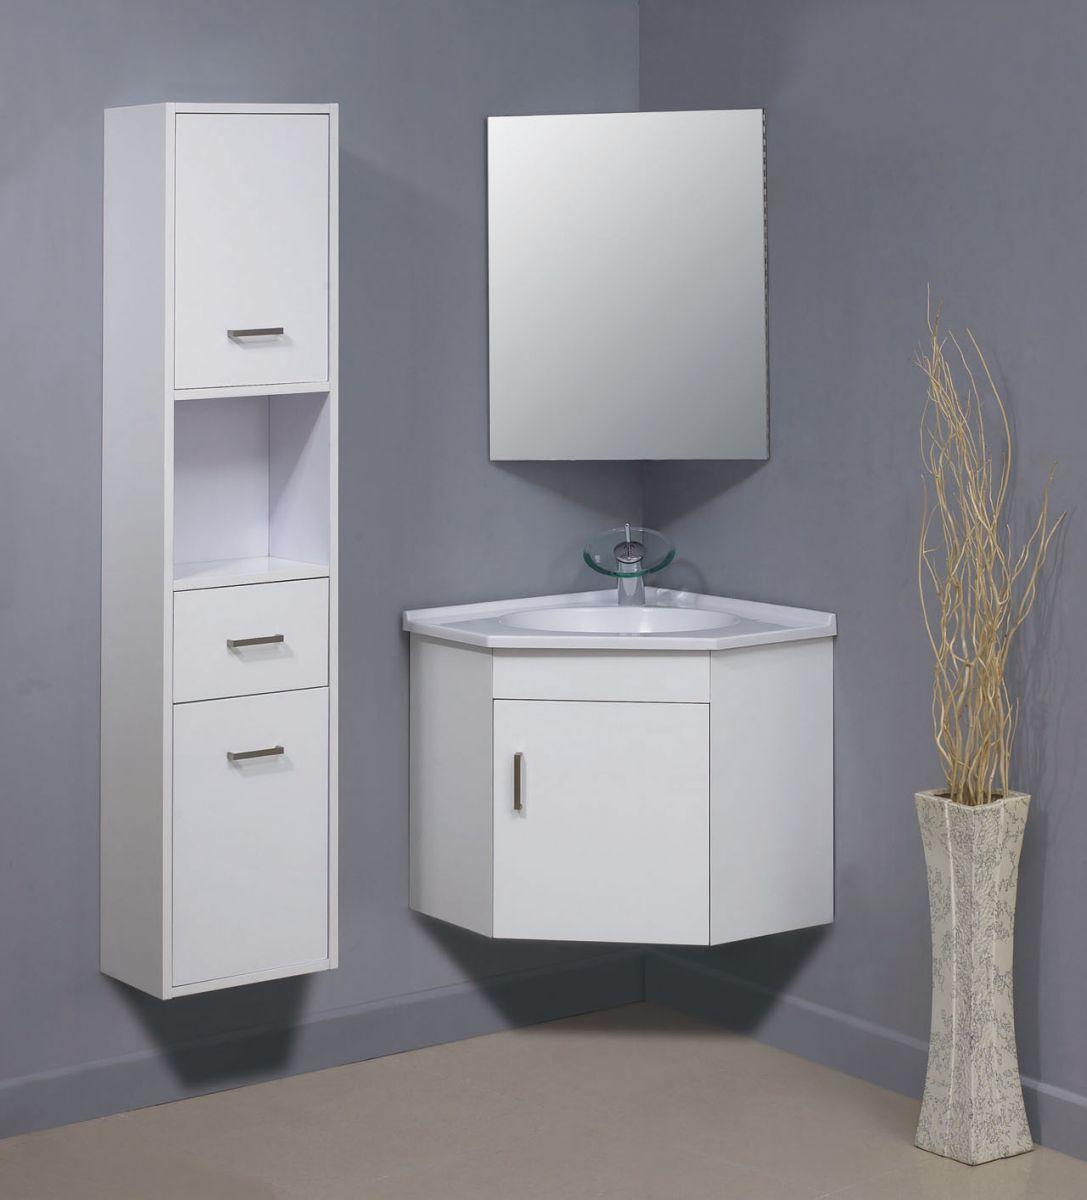 Белая углова тумба со шкафчиком и зеркалом